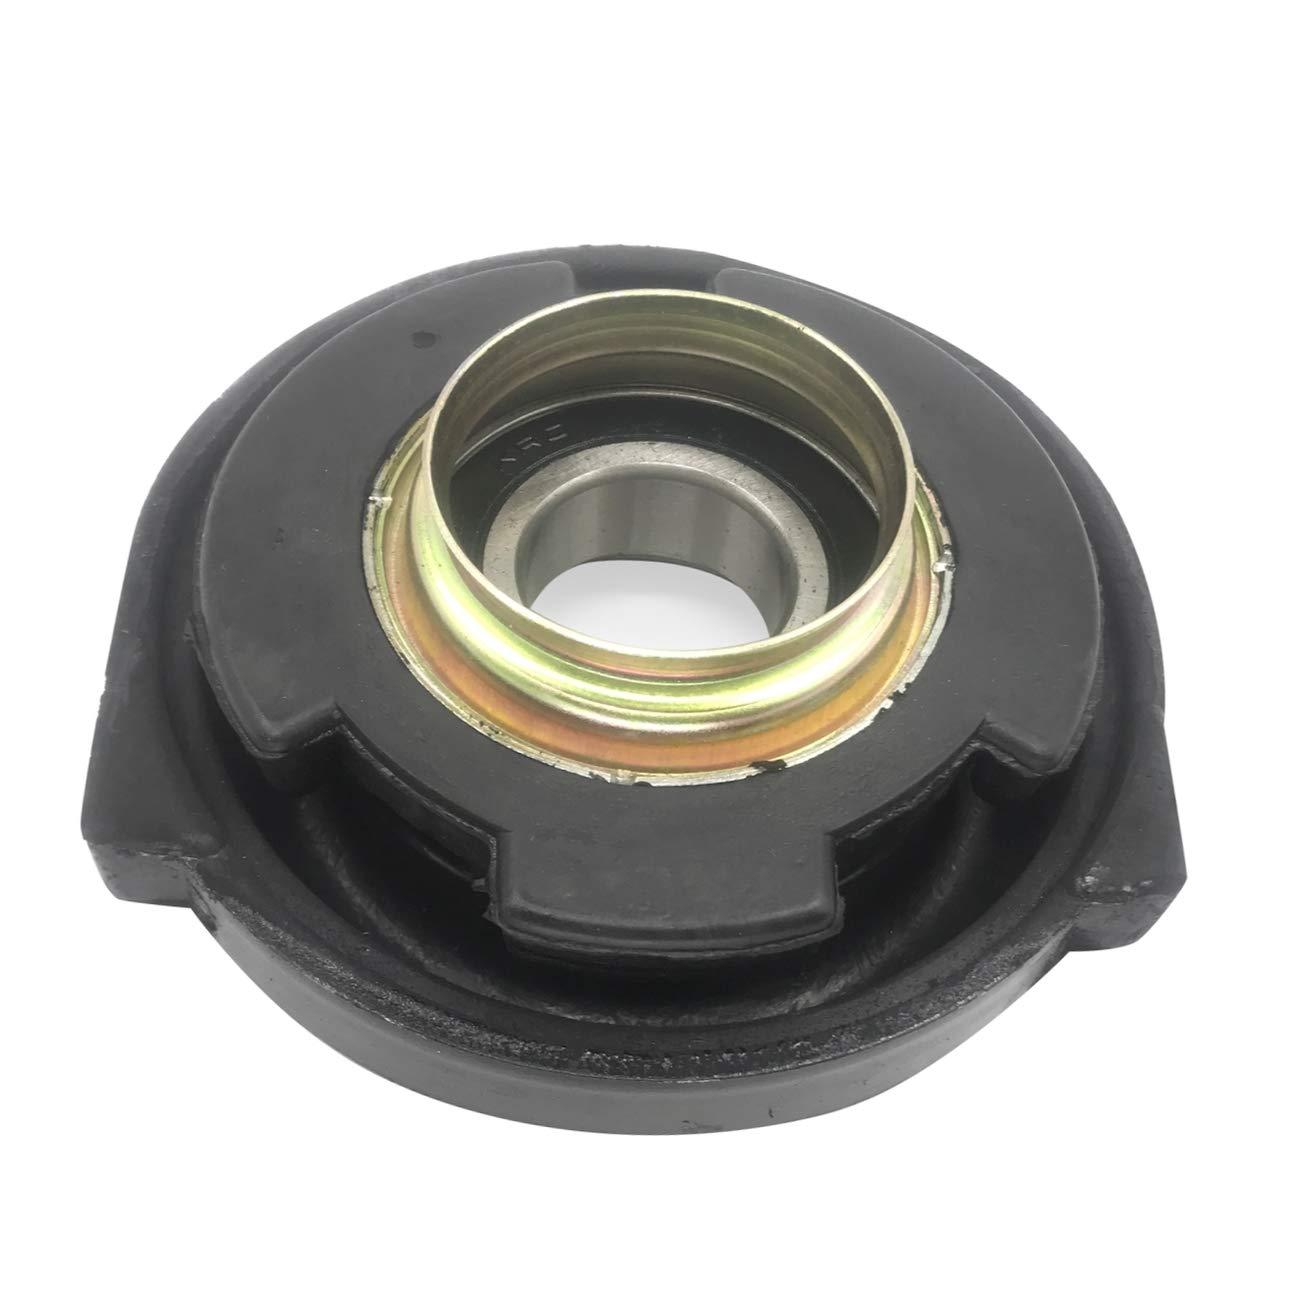 SKP SK934802 Drive Shaft Center Support Bearing